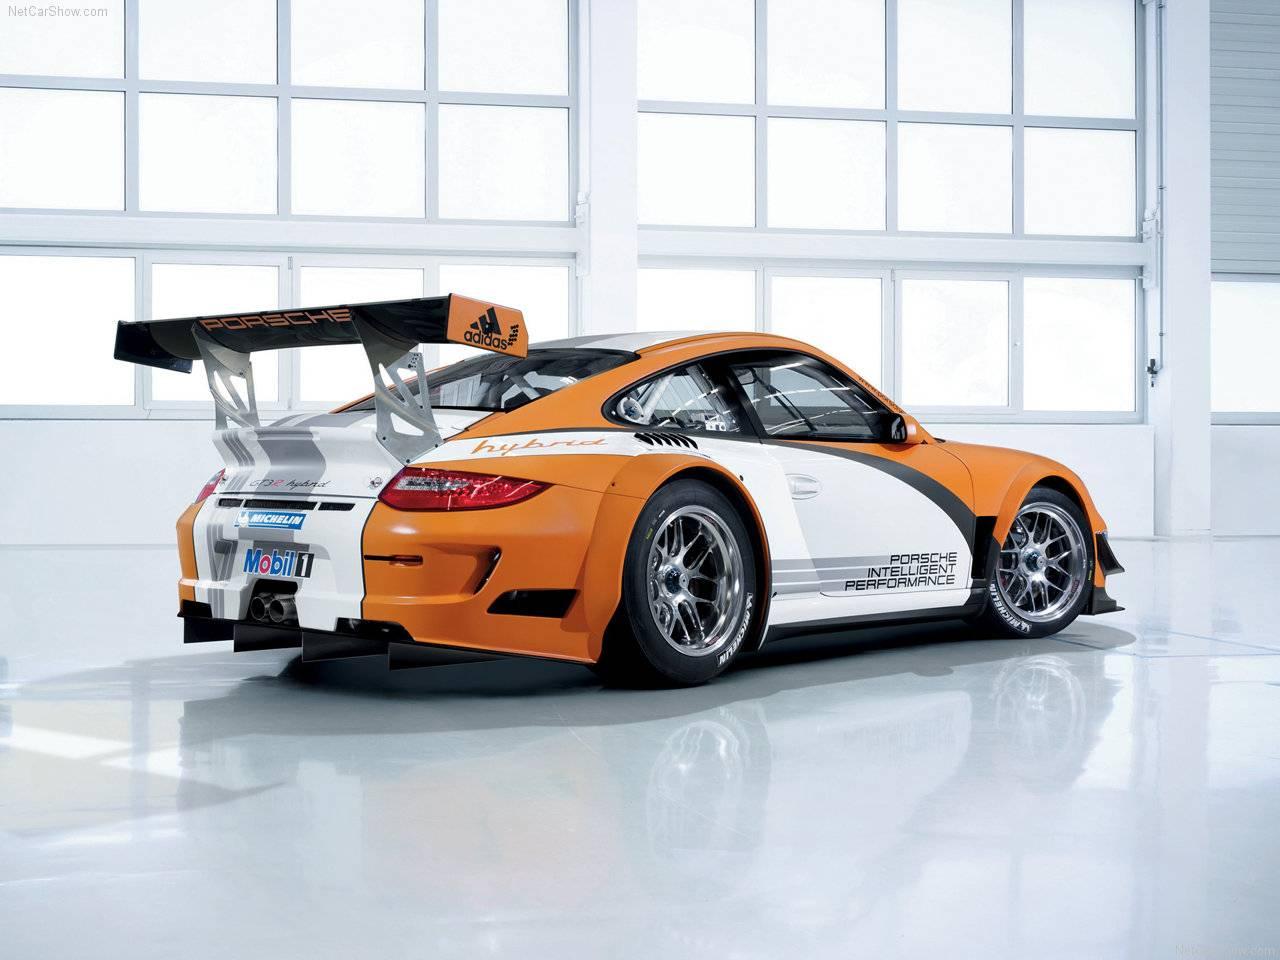 http://2.bp.blogspot.com/_lsyt_wQ2awY/TDrBuenMoJI/AAAAAAAB9wQ/HC-XtY8Huag/s1600/Porsche-911_GT3_R_Hybrid_2011_1280x960_wallpaper_03.jpg